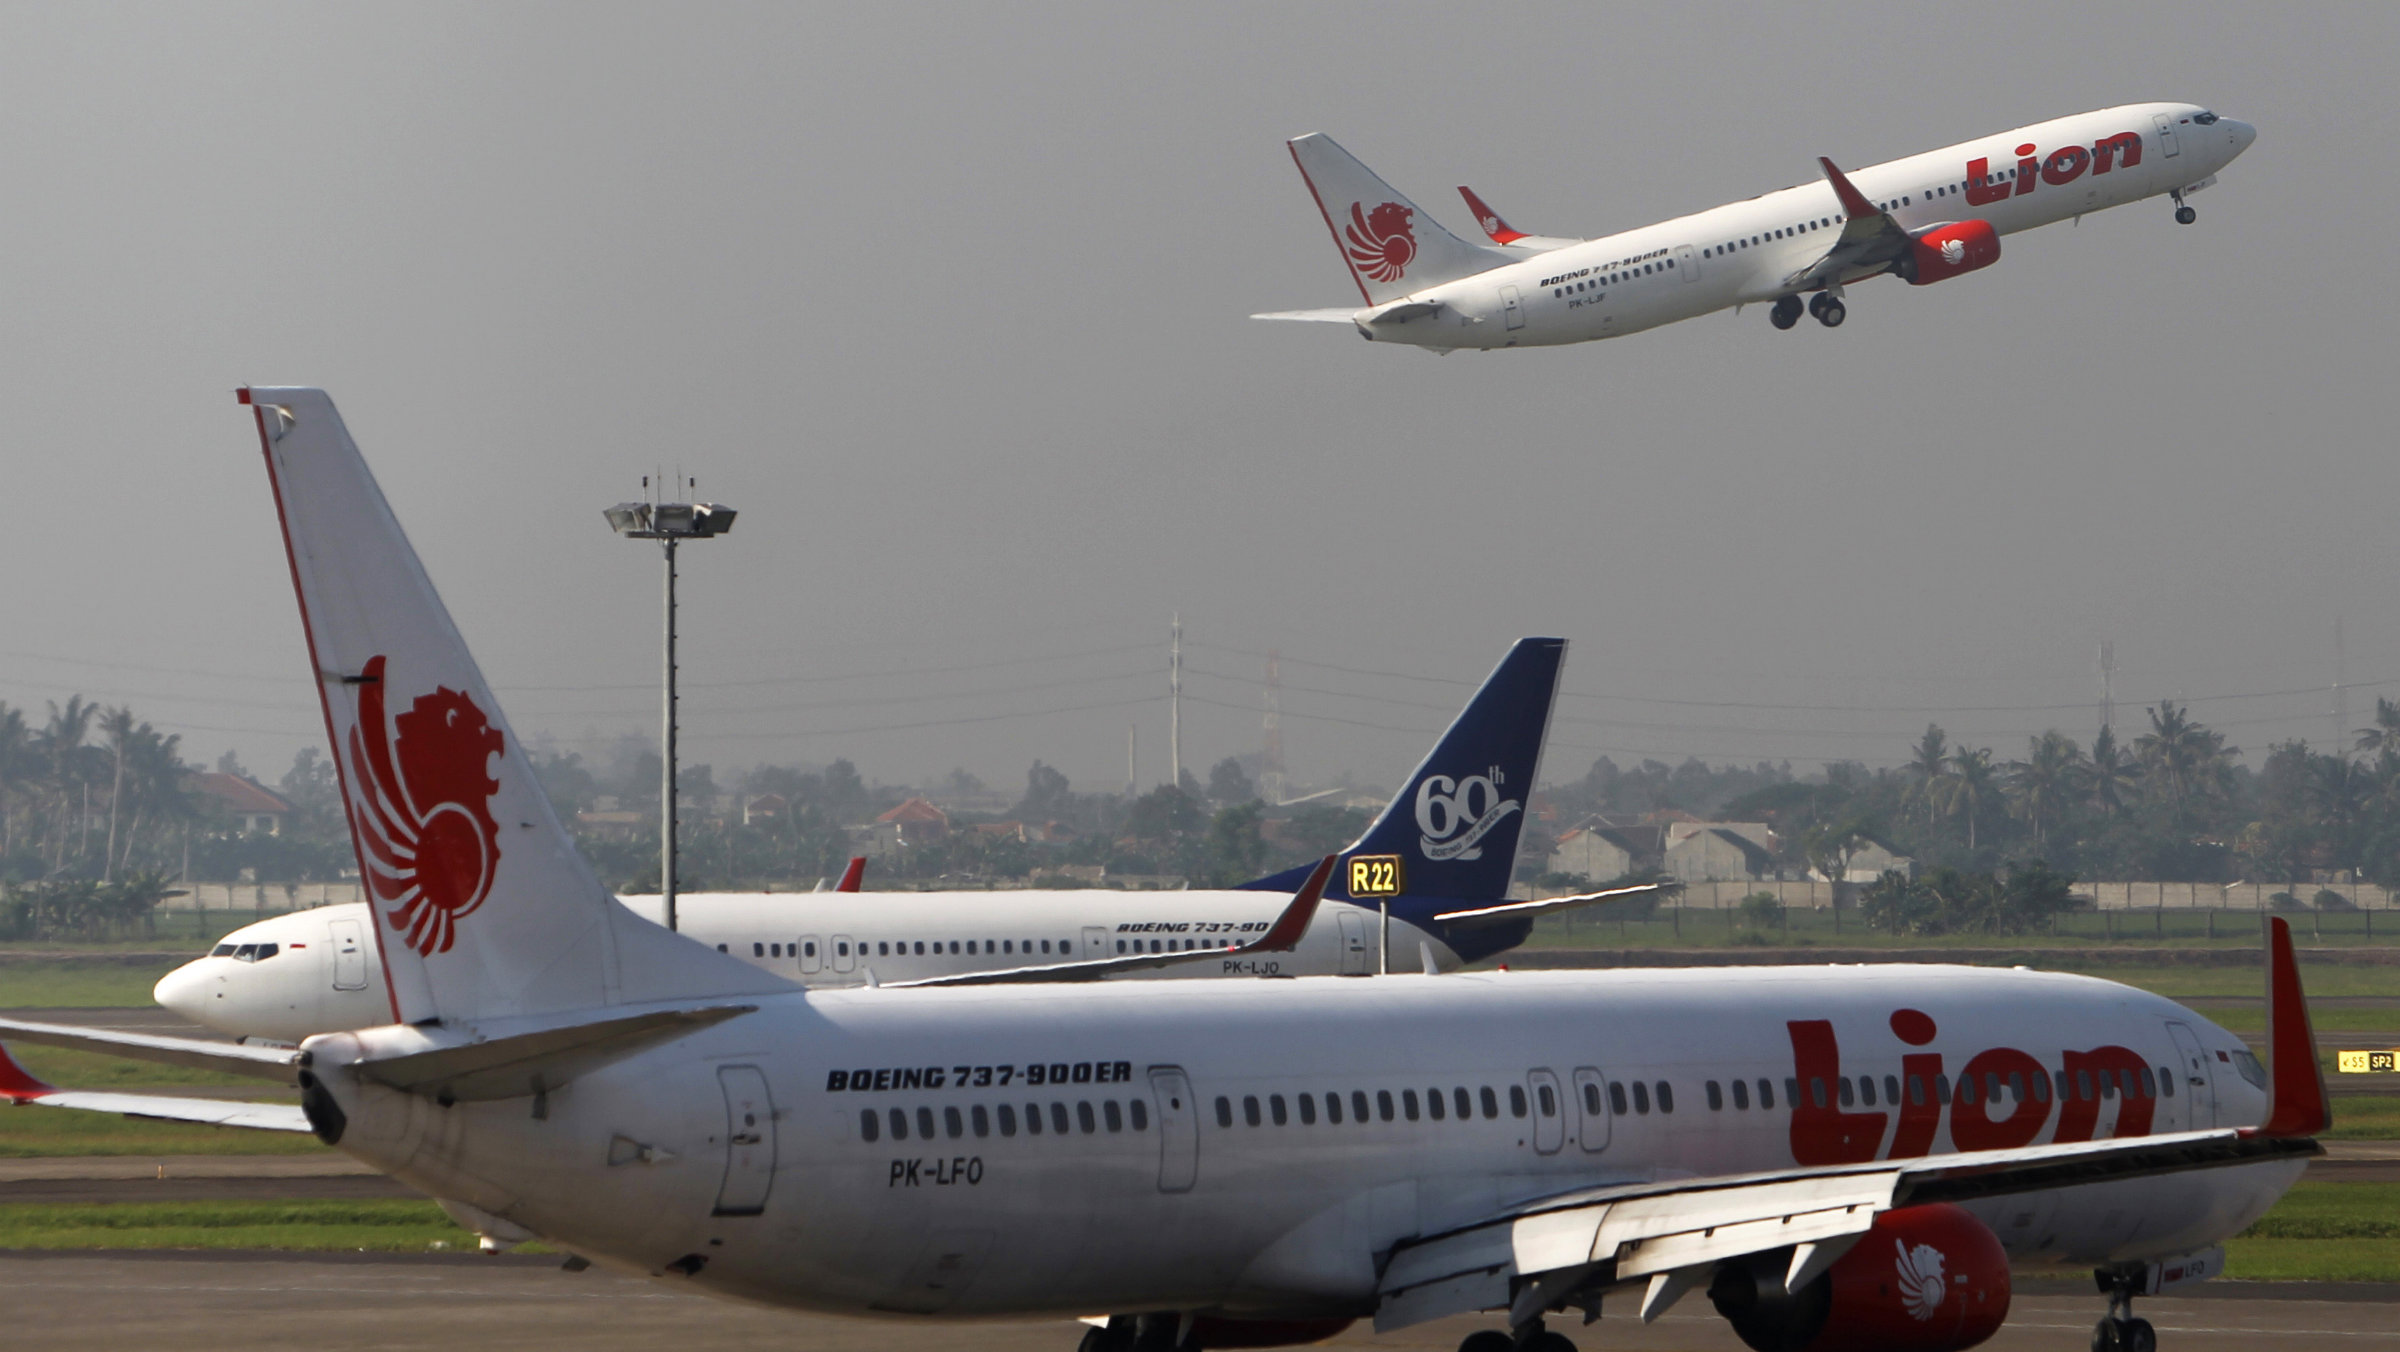 Resultado de imagen para jakarta airport airliners